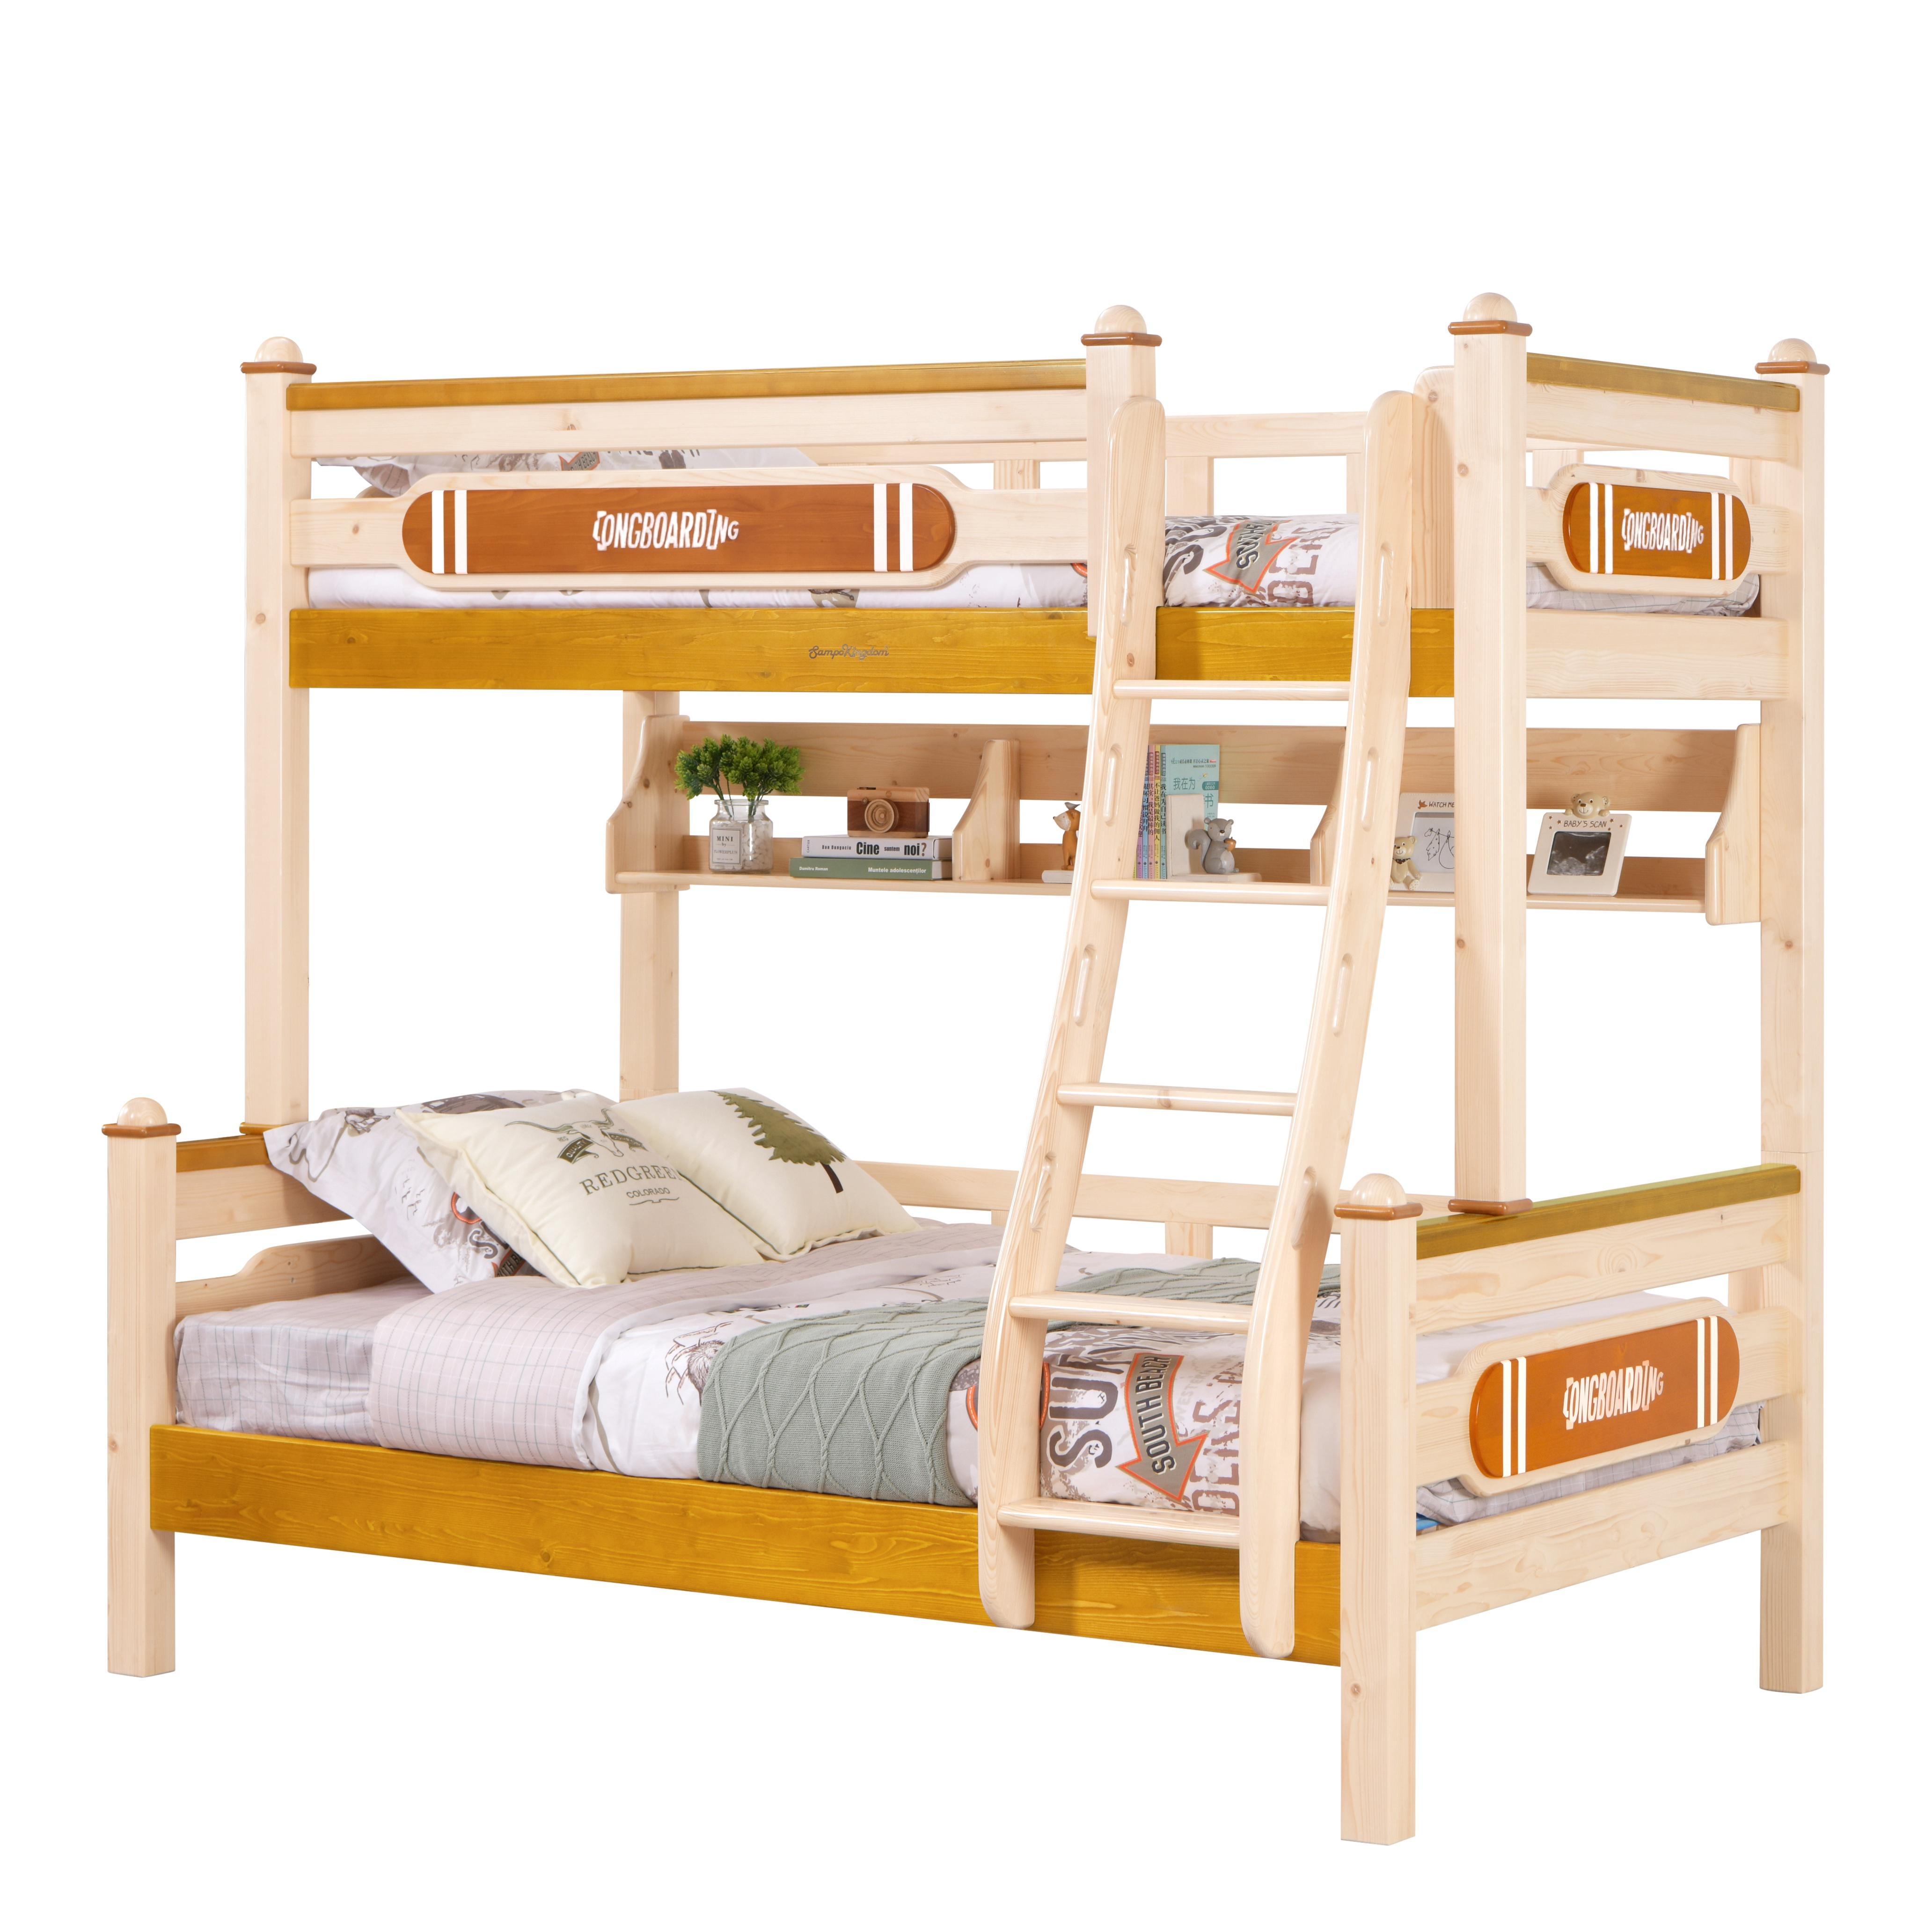 Cheap Wood Children Bunk Bed Kids Indonesia With Factory Price Buy Wood Children Bunk Bed Wood Bunk Bed Kids Wood Bunk Bed Indonesia Product On Alibaba Com